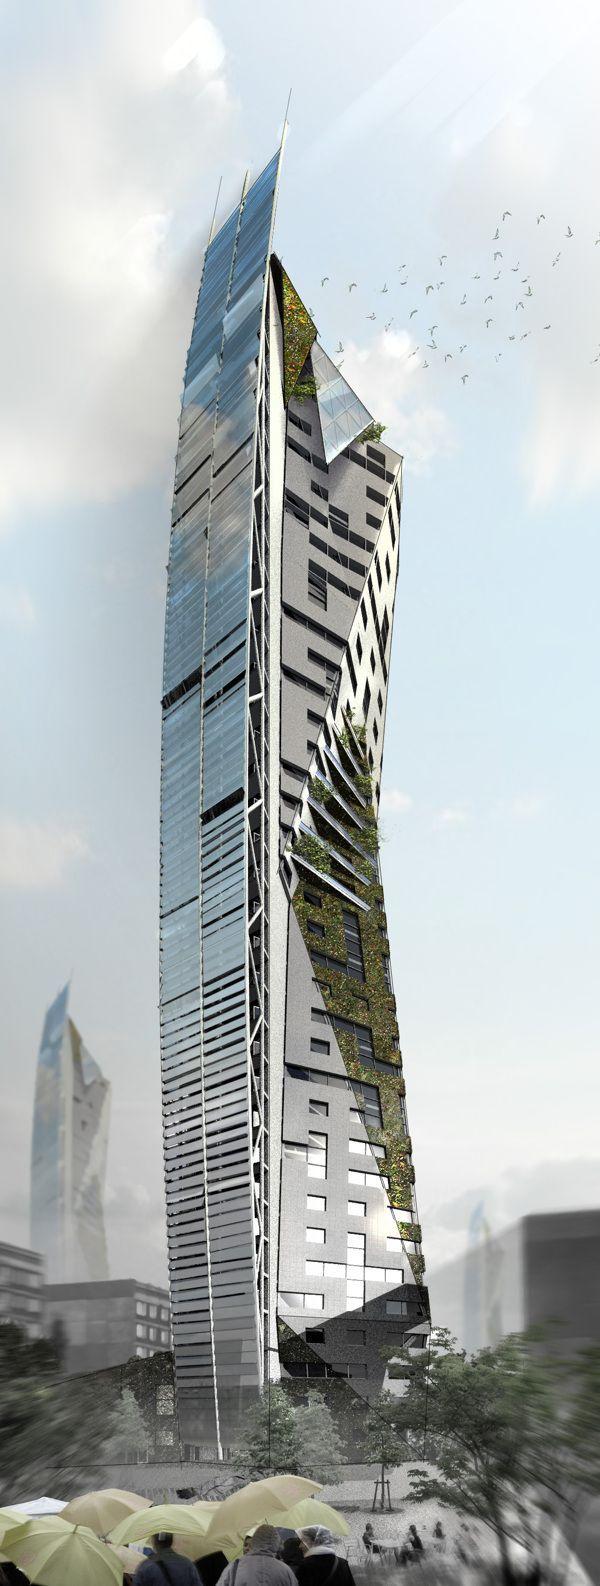 Eco Tower, Kiev, Ukraine by Pavlo Kryvozub